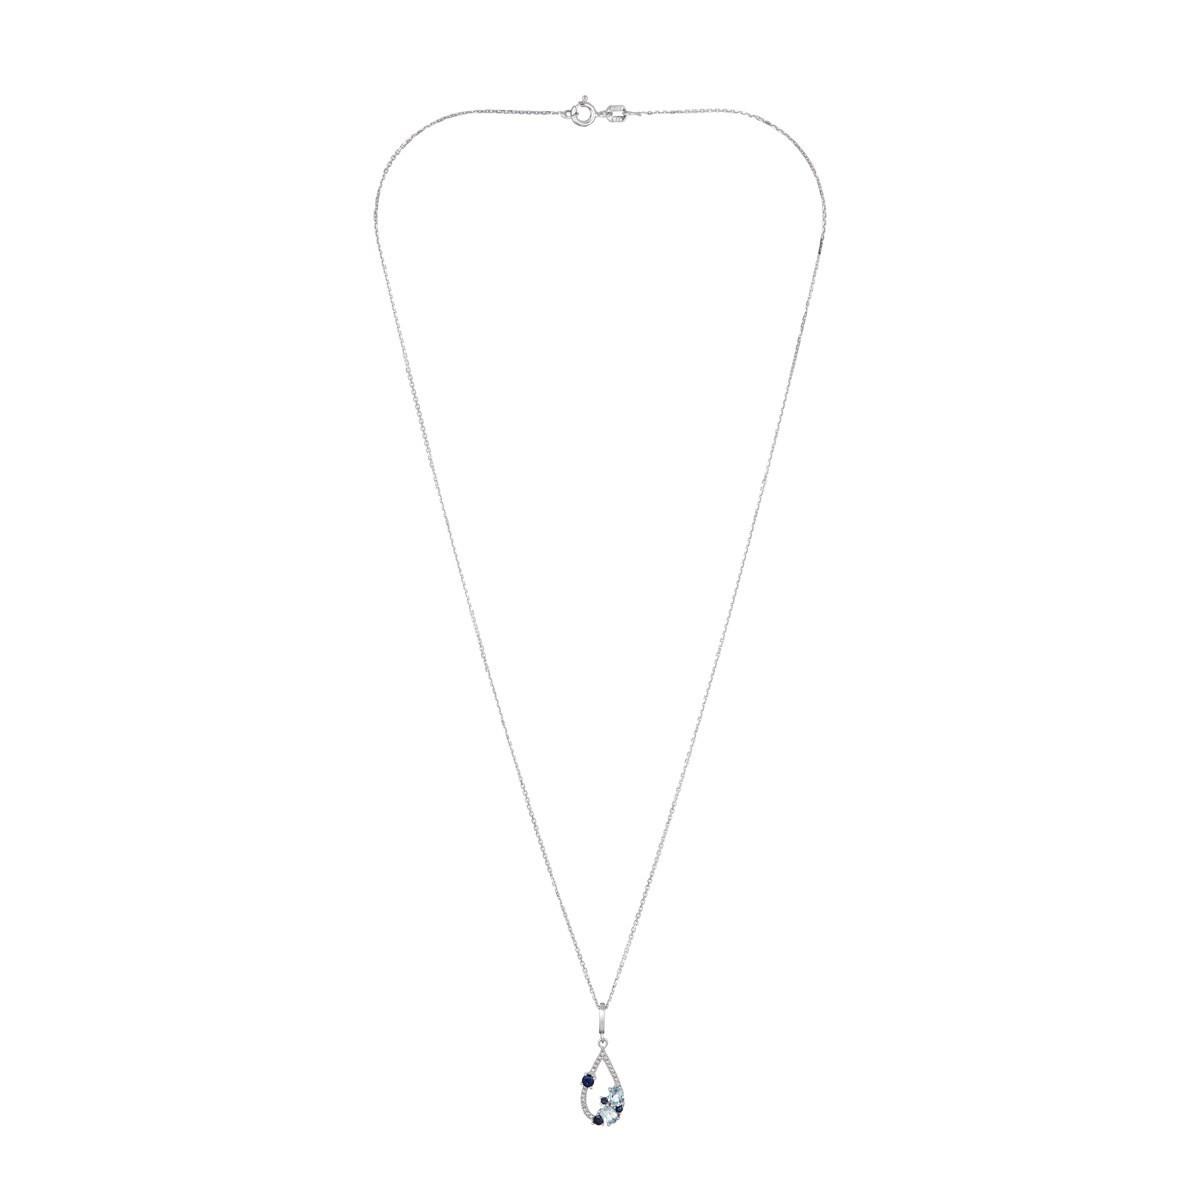 "Pendentif Or Blanc ""SAPHIR ELIXIR"" Diamants 0,01 carat avec Topaze Bleue 0,48 carat et Saphir 0,25 carat"